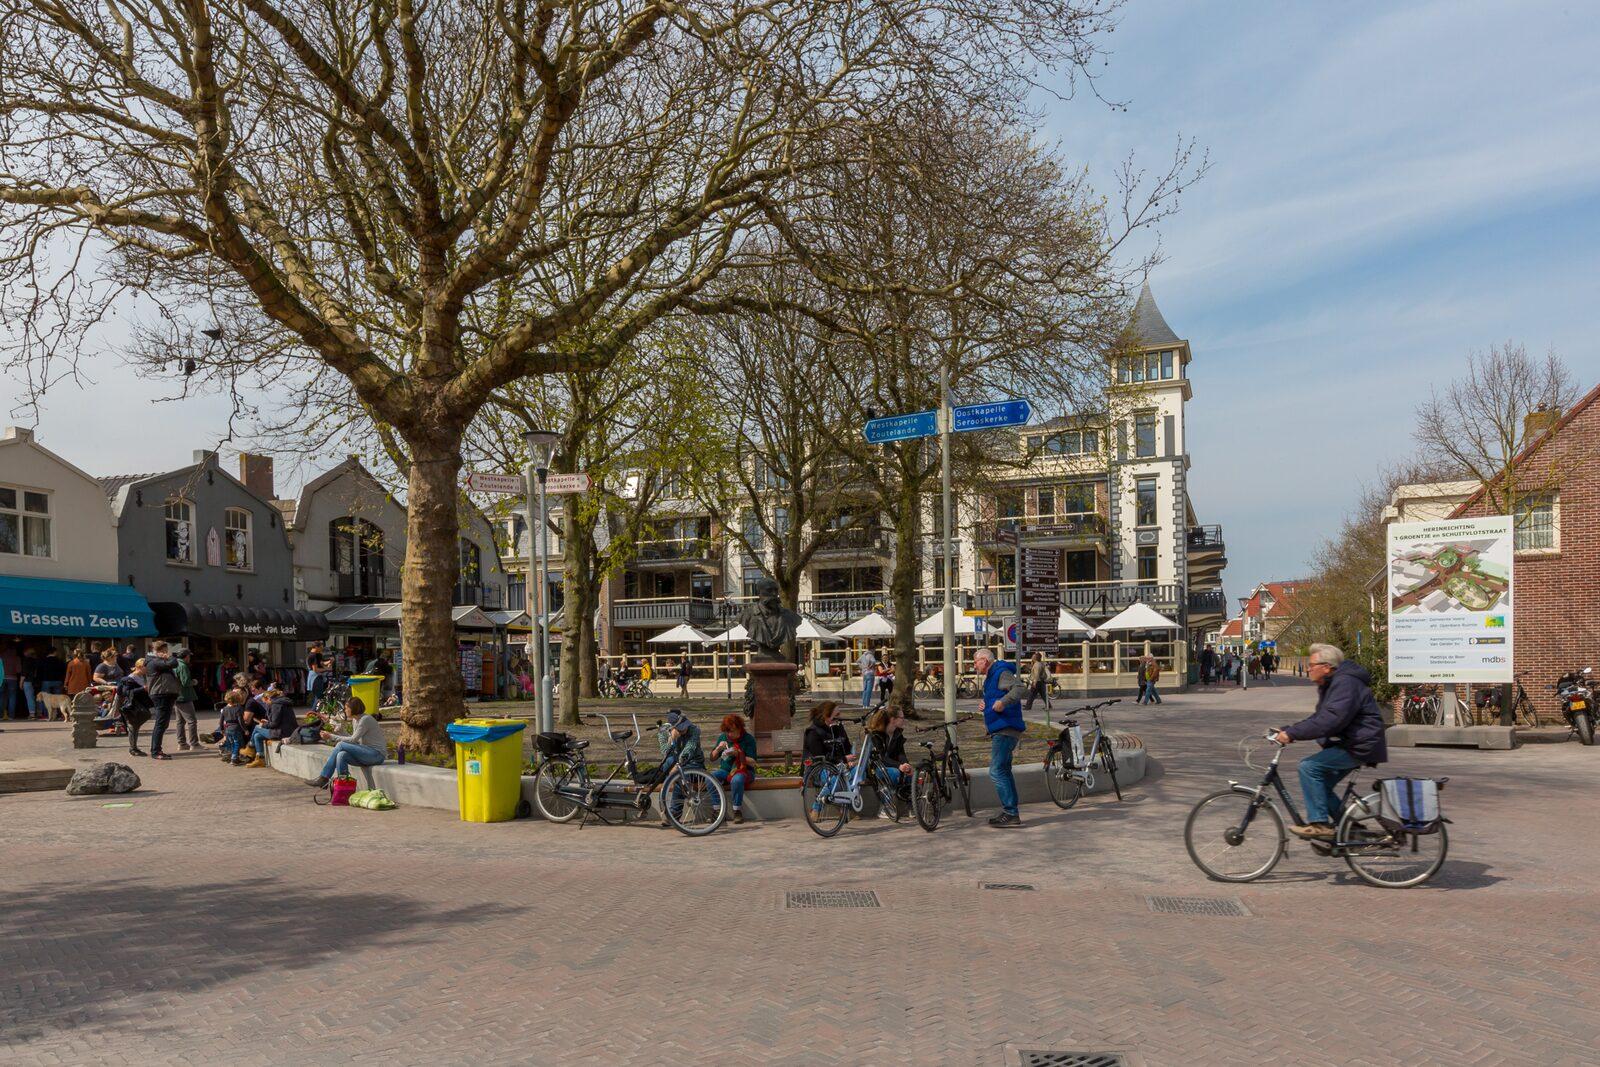 Ferienhaus - Piet Mondriaanstraat 6a | Domburg